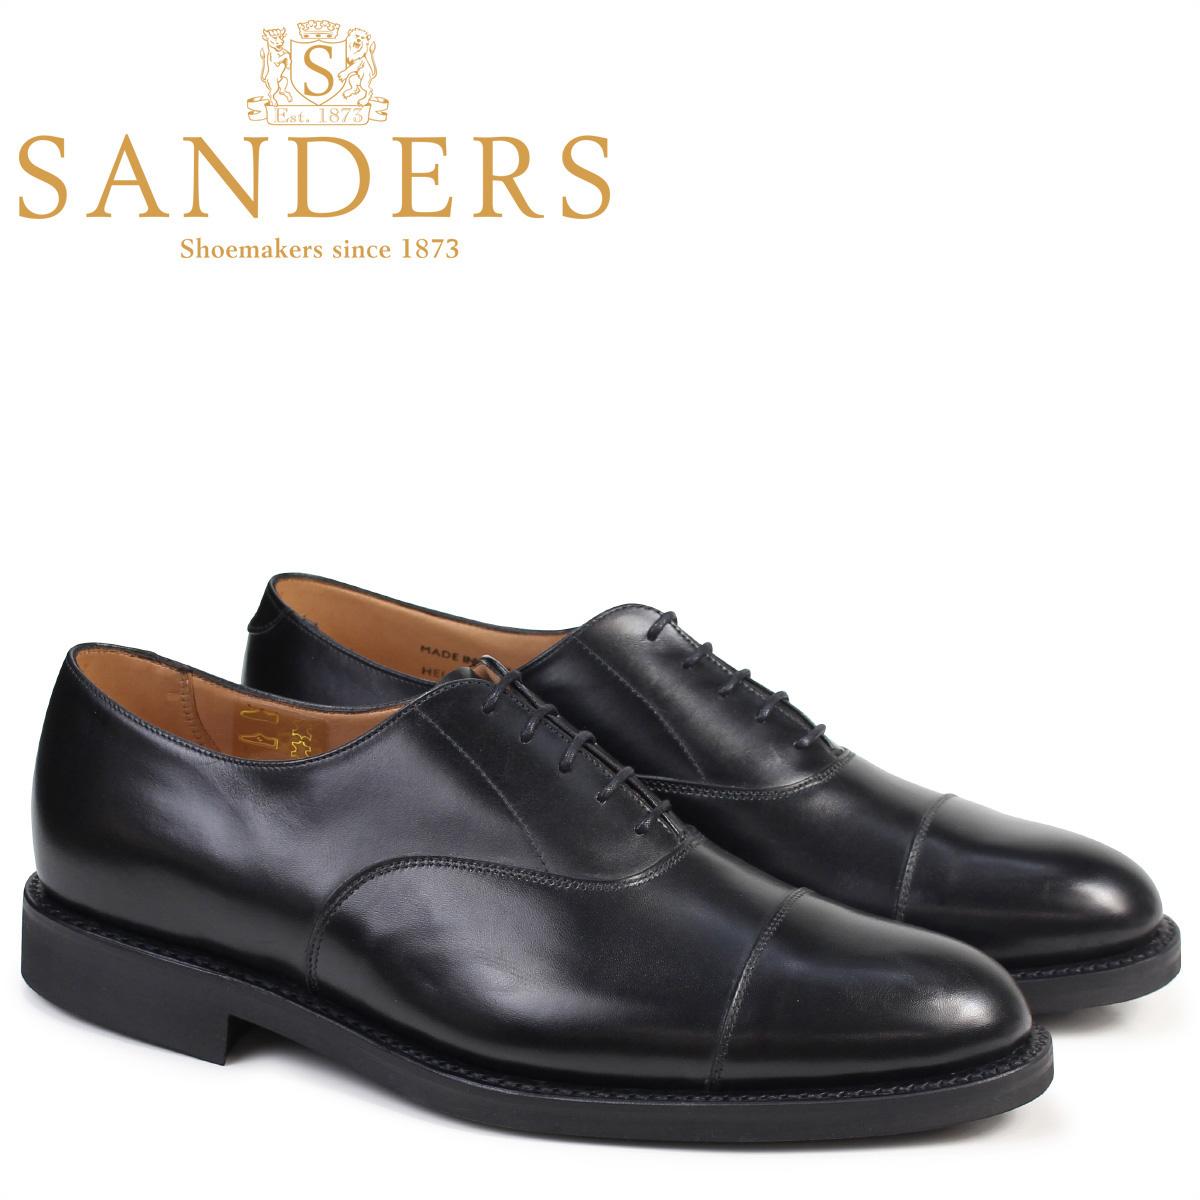 SANDERS 靴 サンダース ミリタリー オックスフォード シューズ ビジネス HELSINKI 9175B ダイナイトソール メンズ ブラック